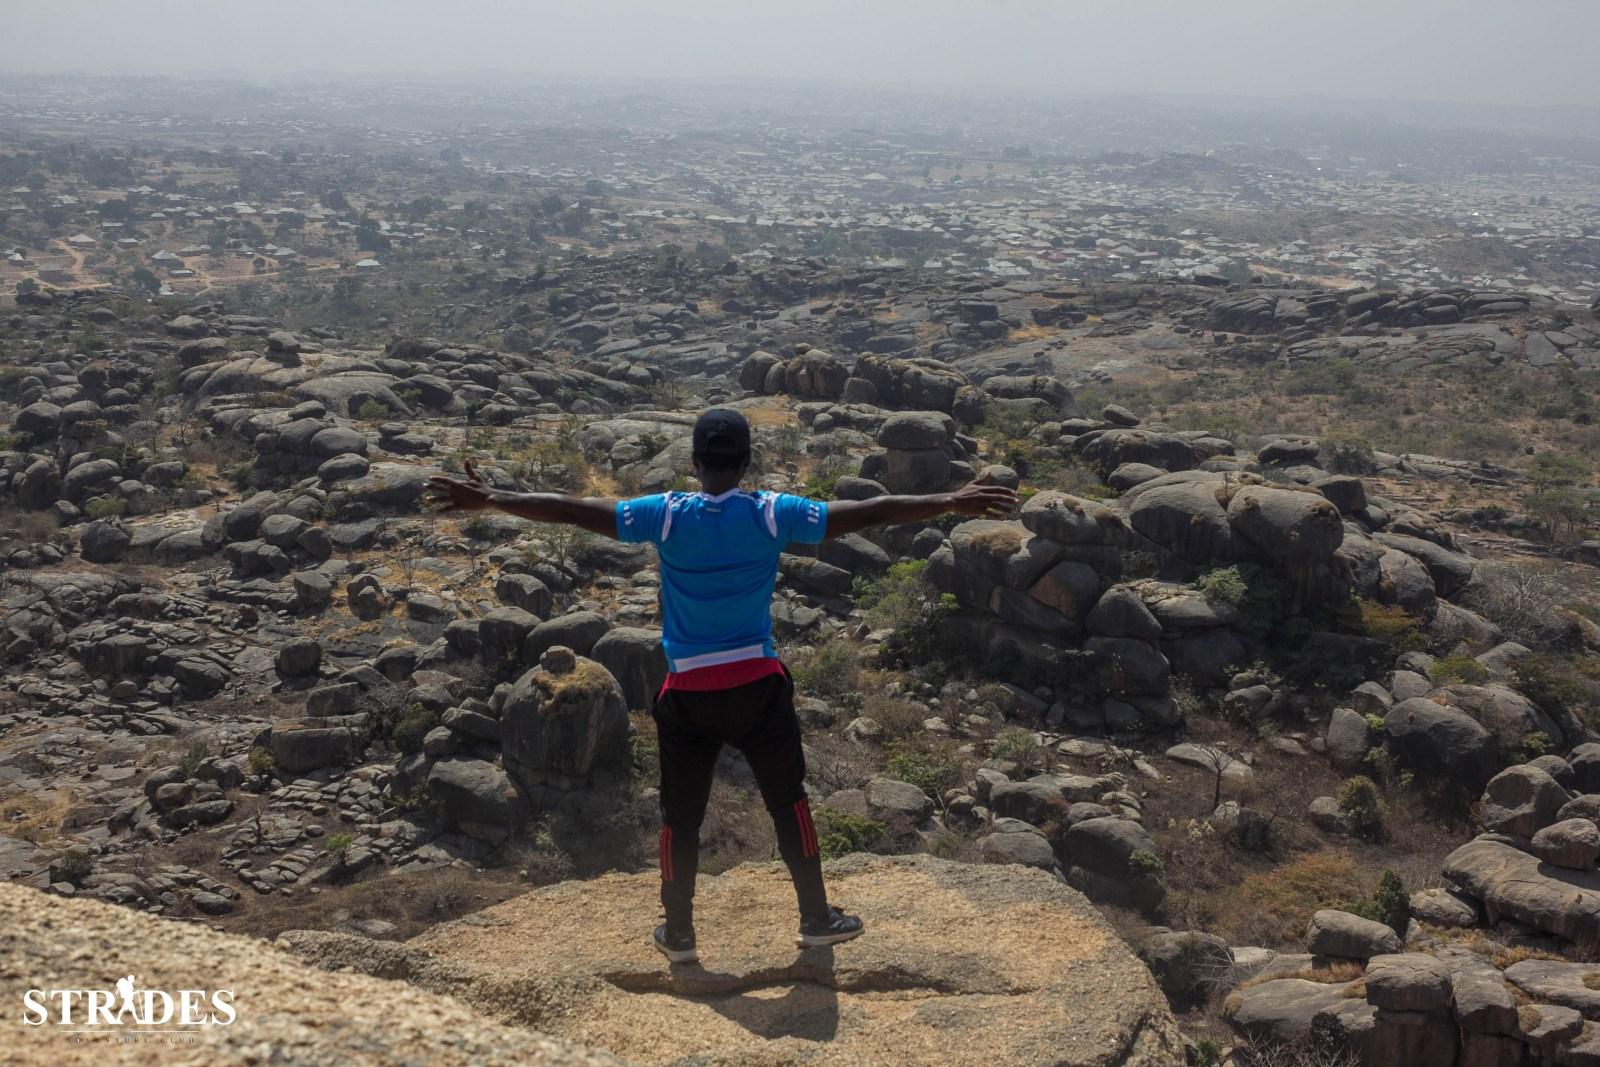 Shere Hills Nigeria